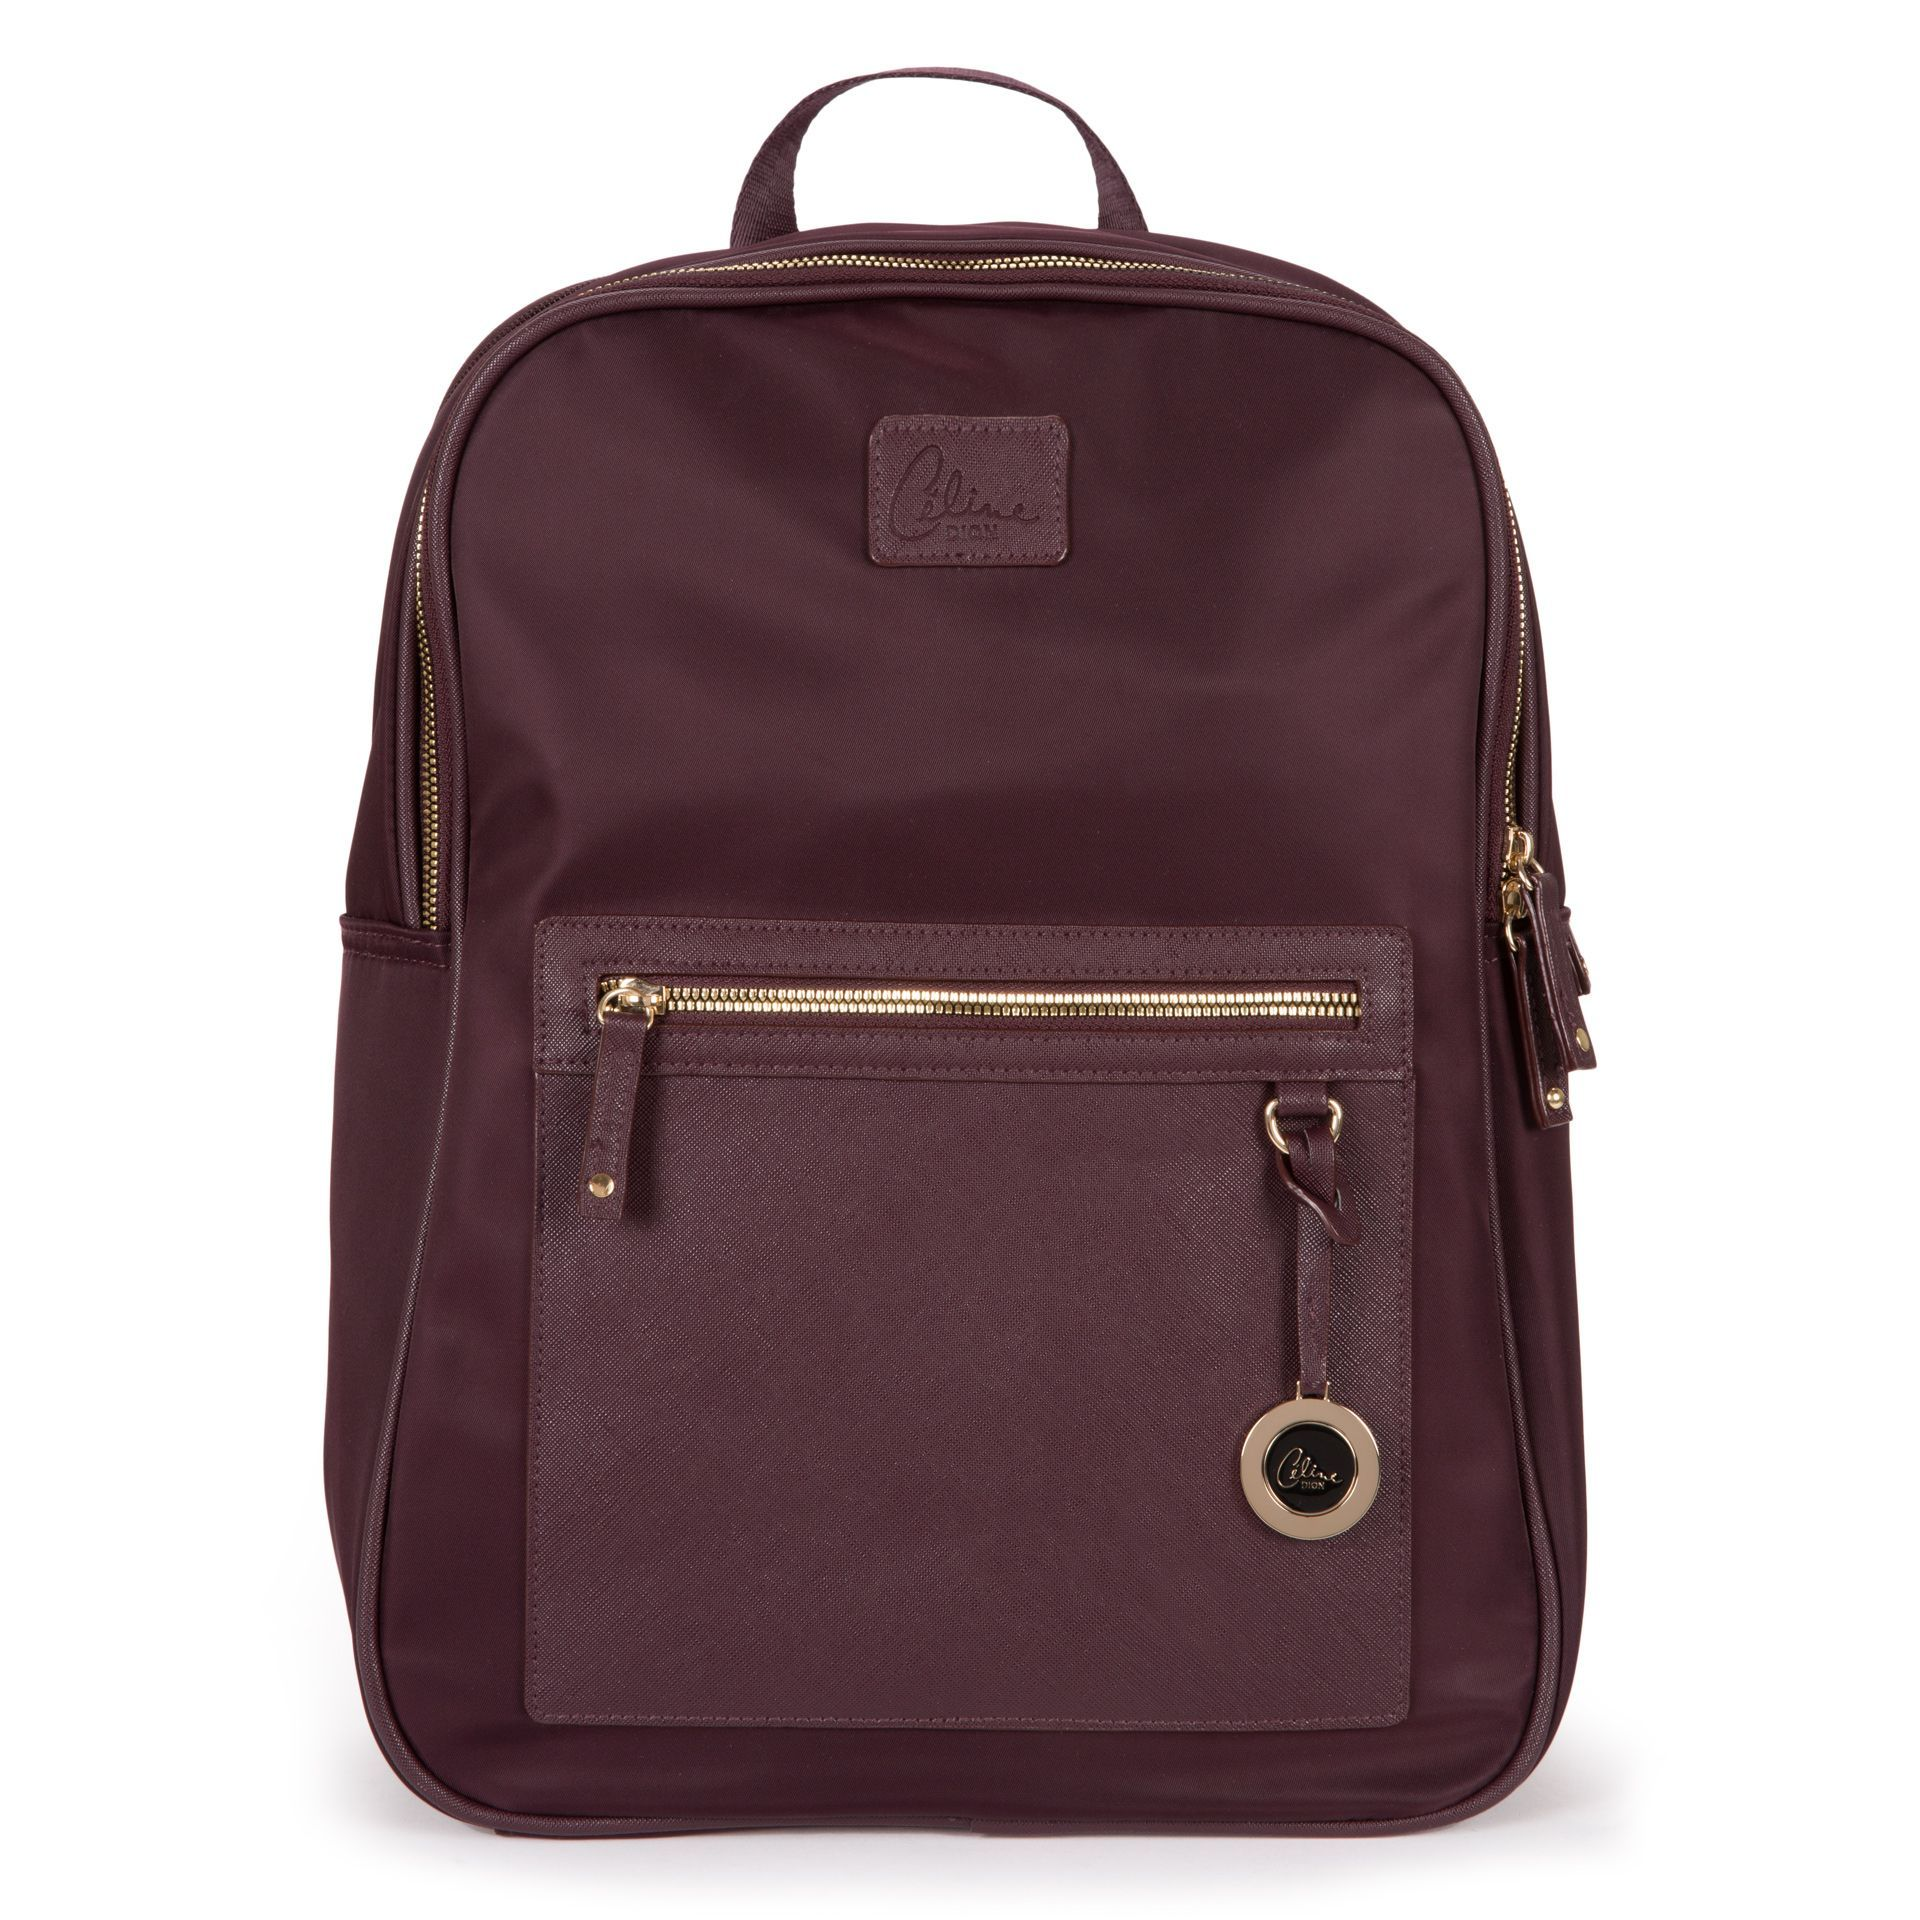 Backpack Fashion Black Nylon Bentley Dion Céline wqatq